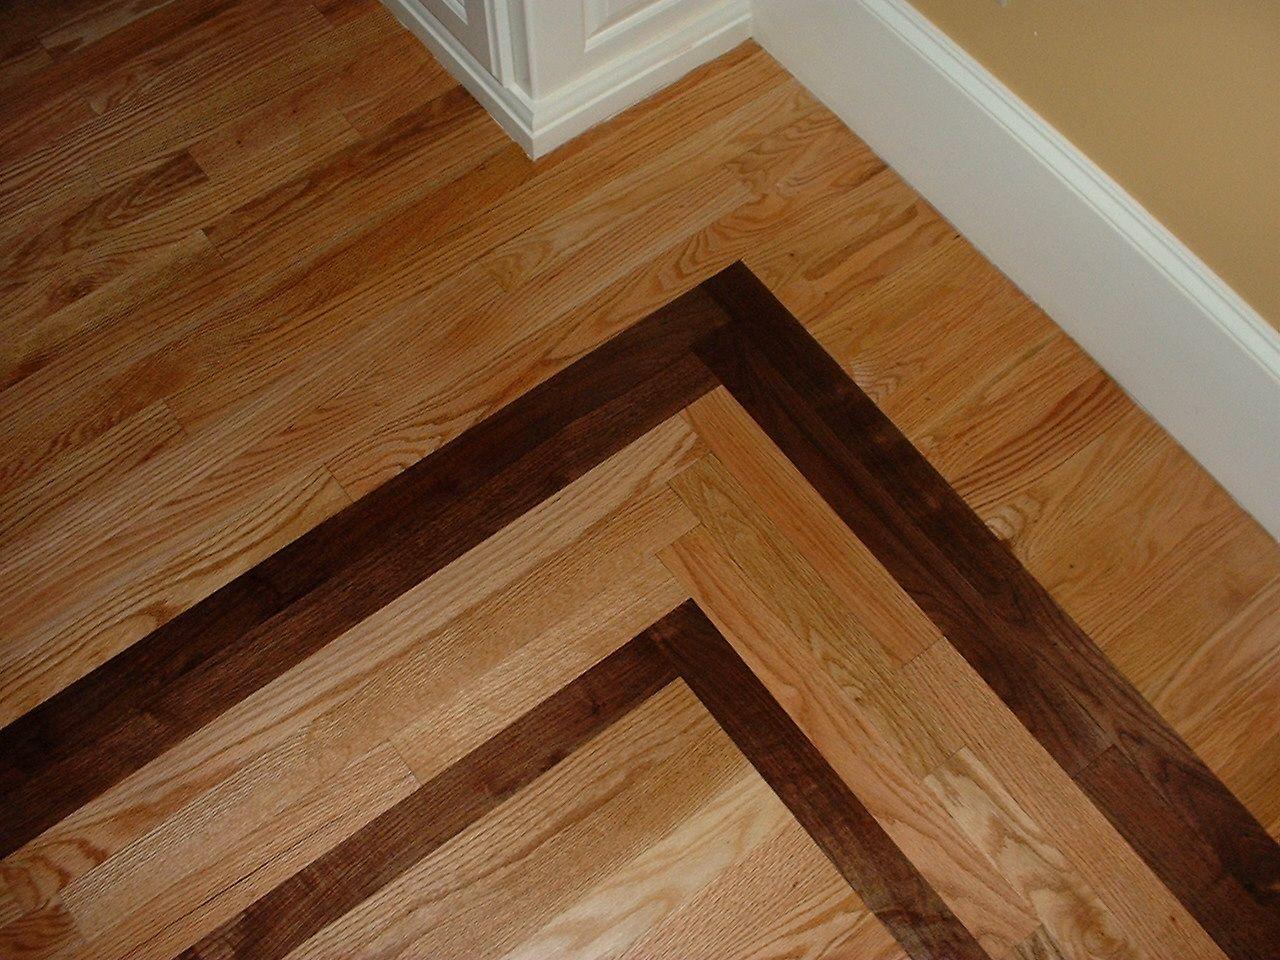 wood floor designs borders. Borders | Ozark Hardwood Flooring Wood Floor Designs E